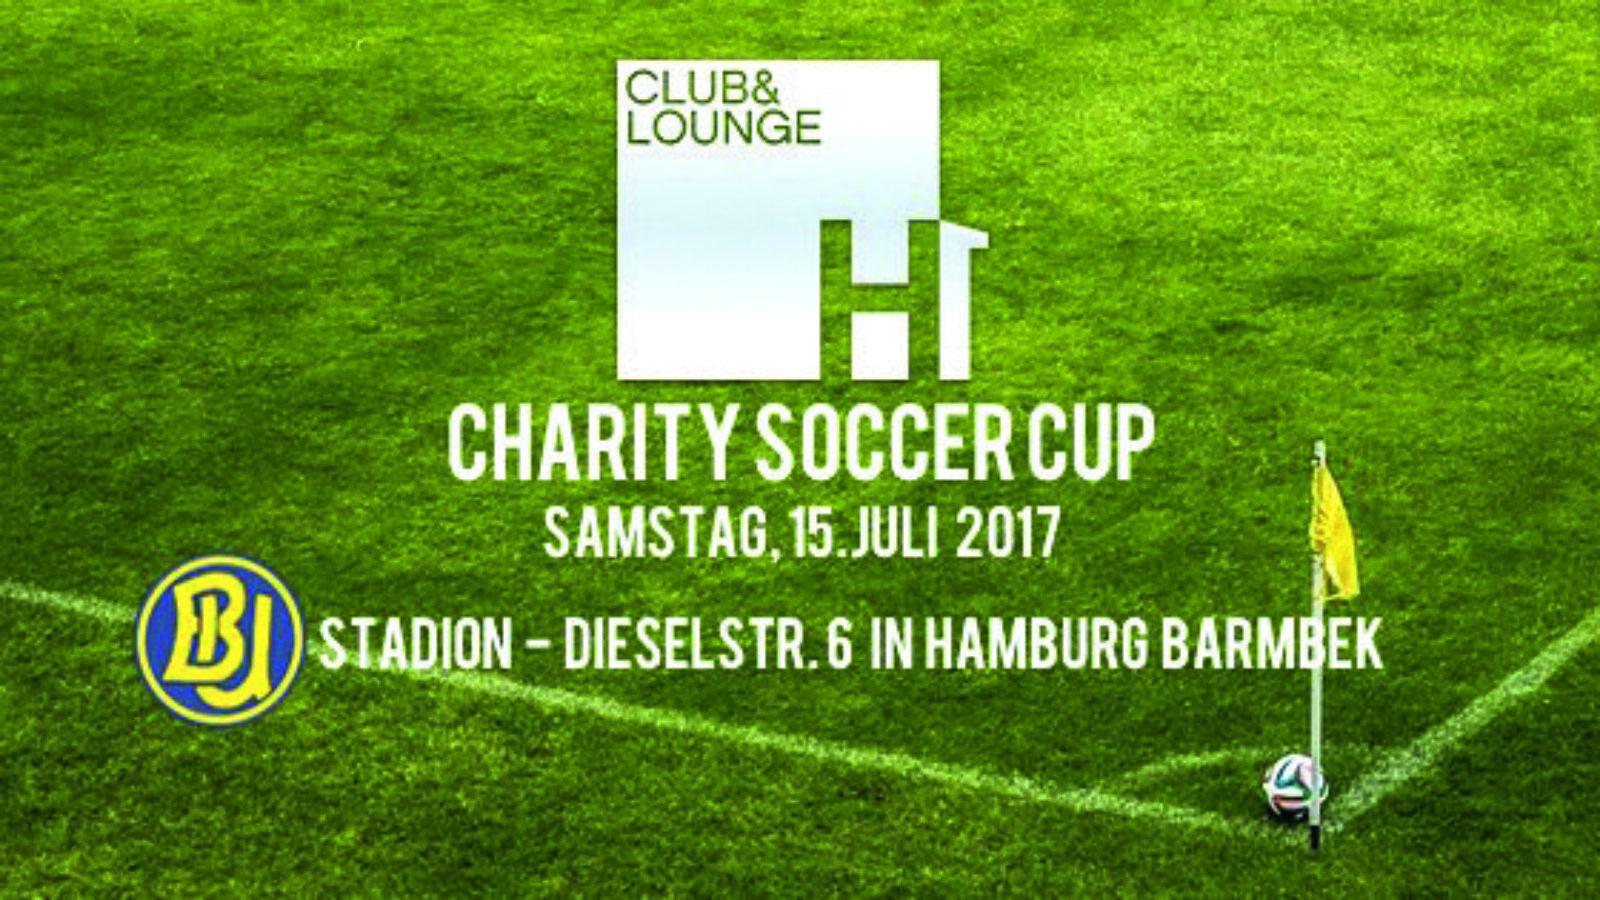 Charity Soccer Club